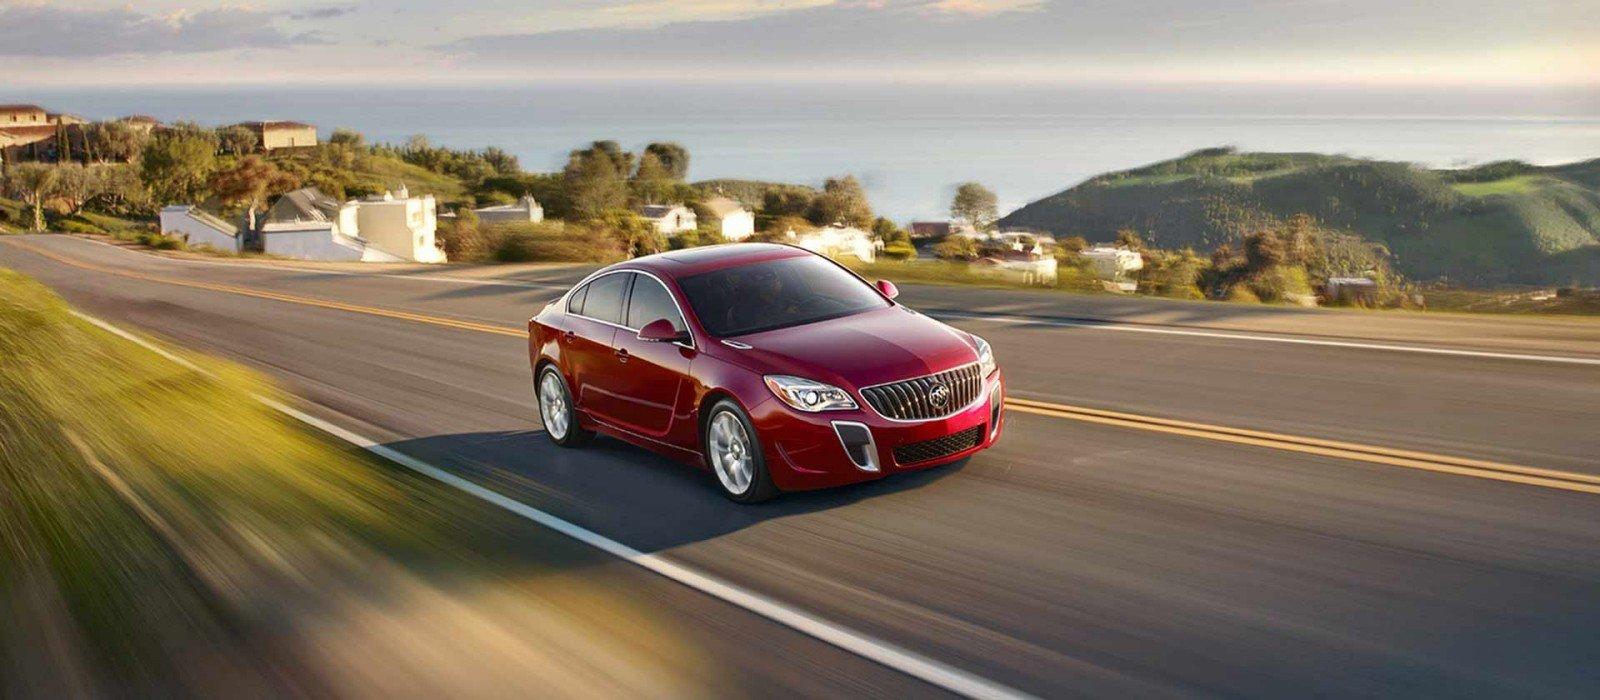 Buick Regal: Technical Data